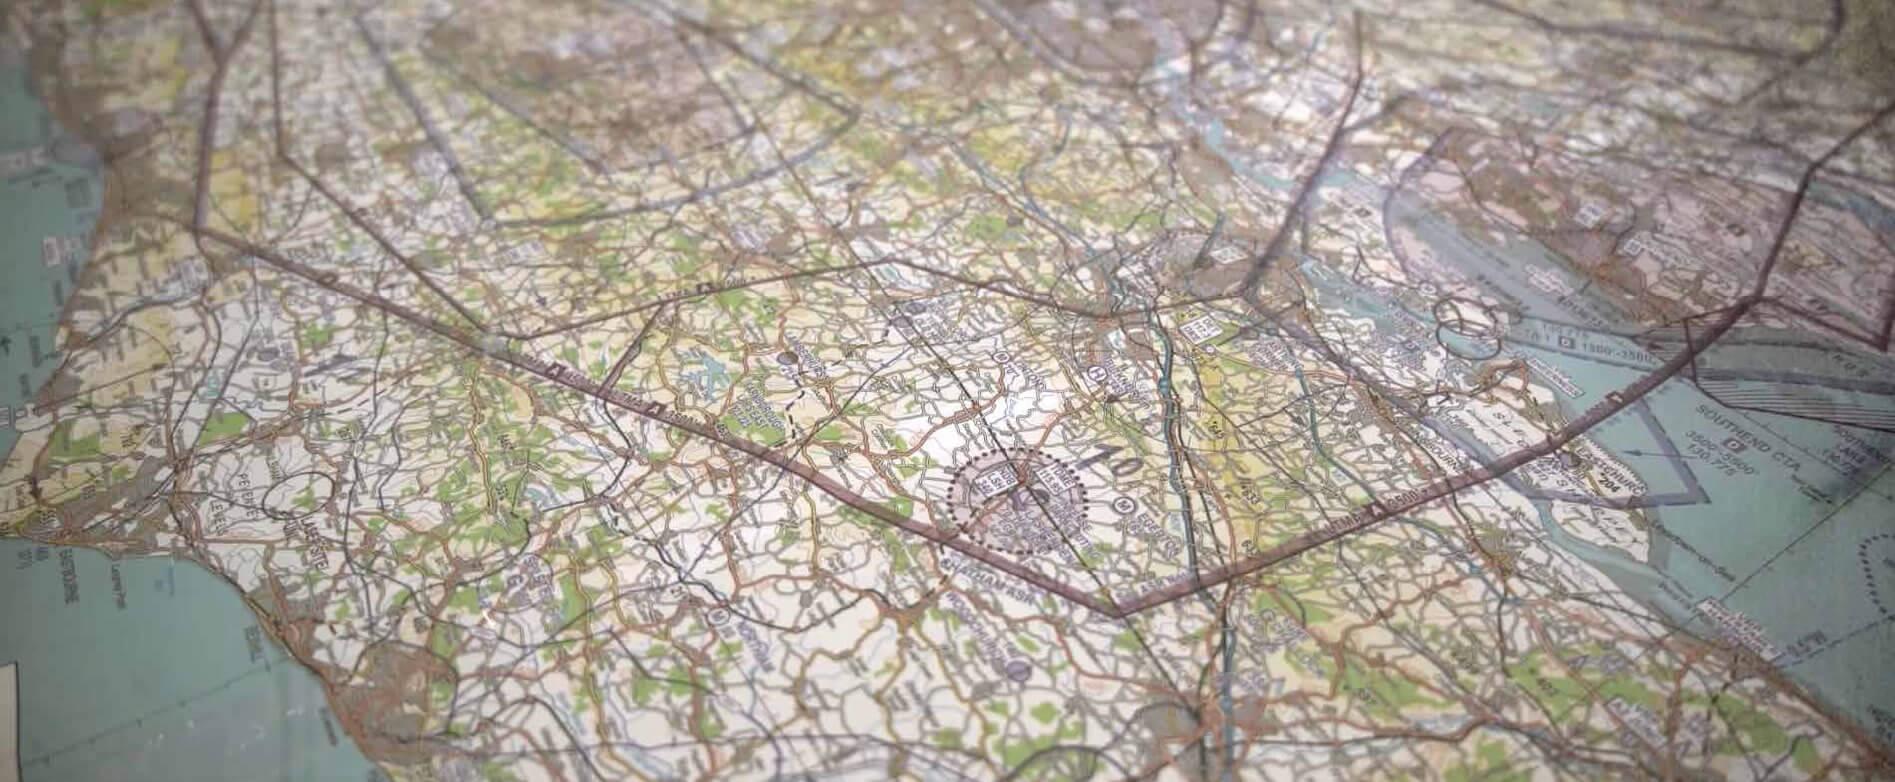 headcorn_map